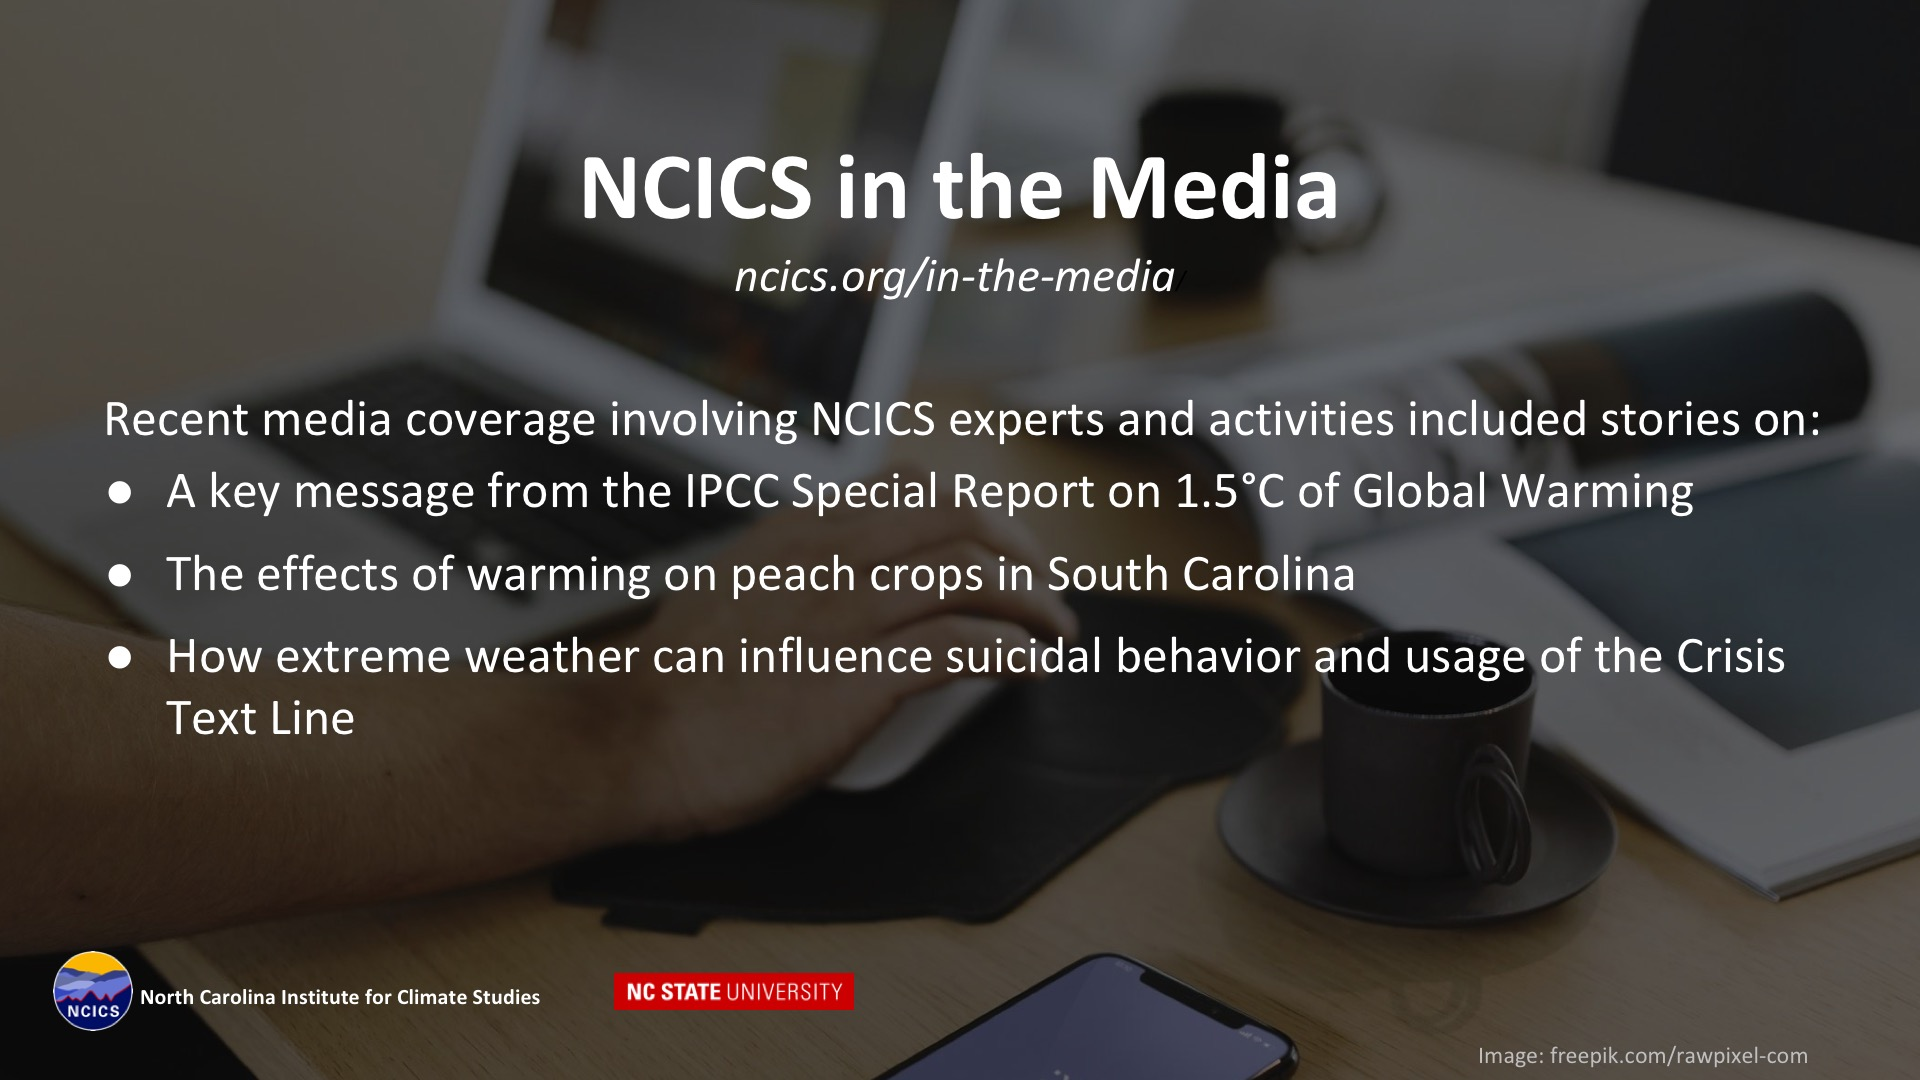 NCICS in the Media